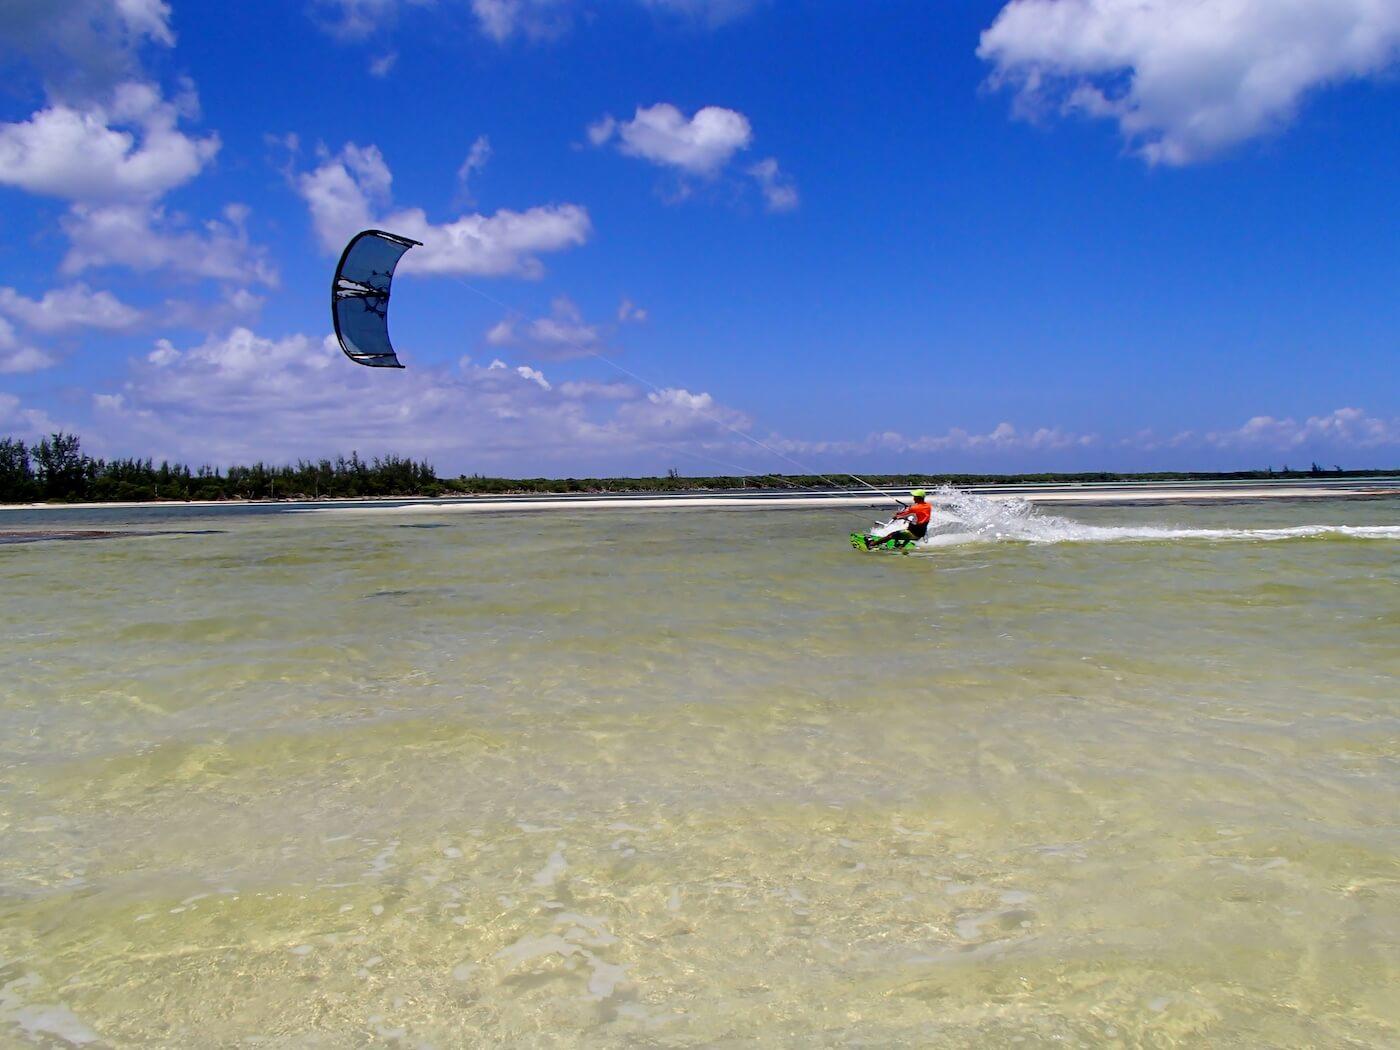 Kiteboarding-7